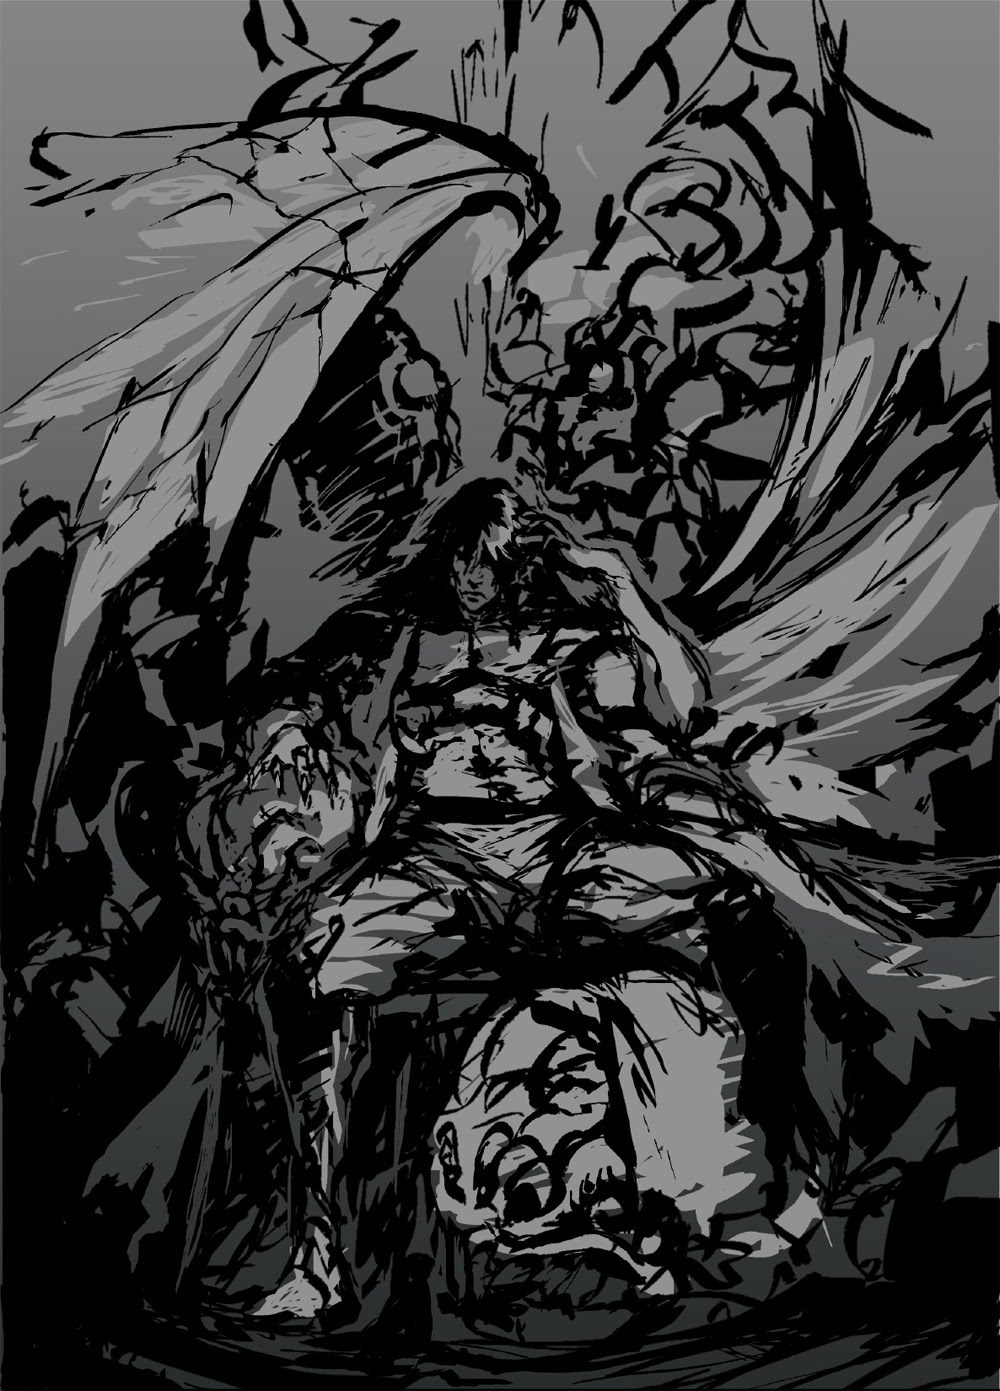 http://game-saga.com/wp-content/uploads/2018/12/castlevania-lords-of-shadow-2-artwork-1.jpg